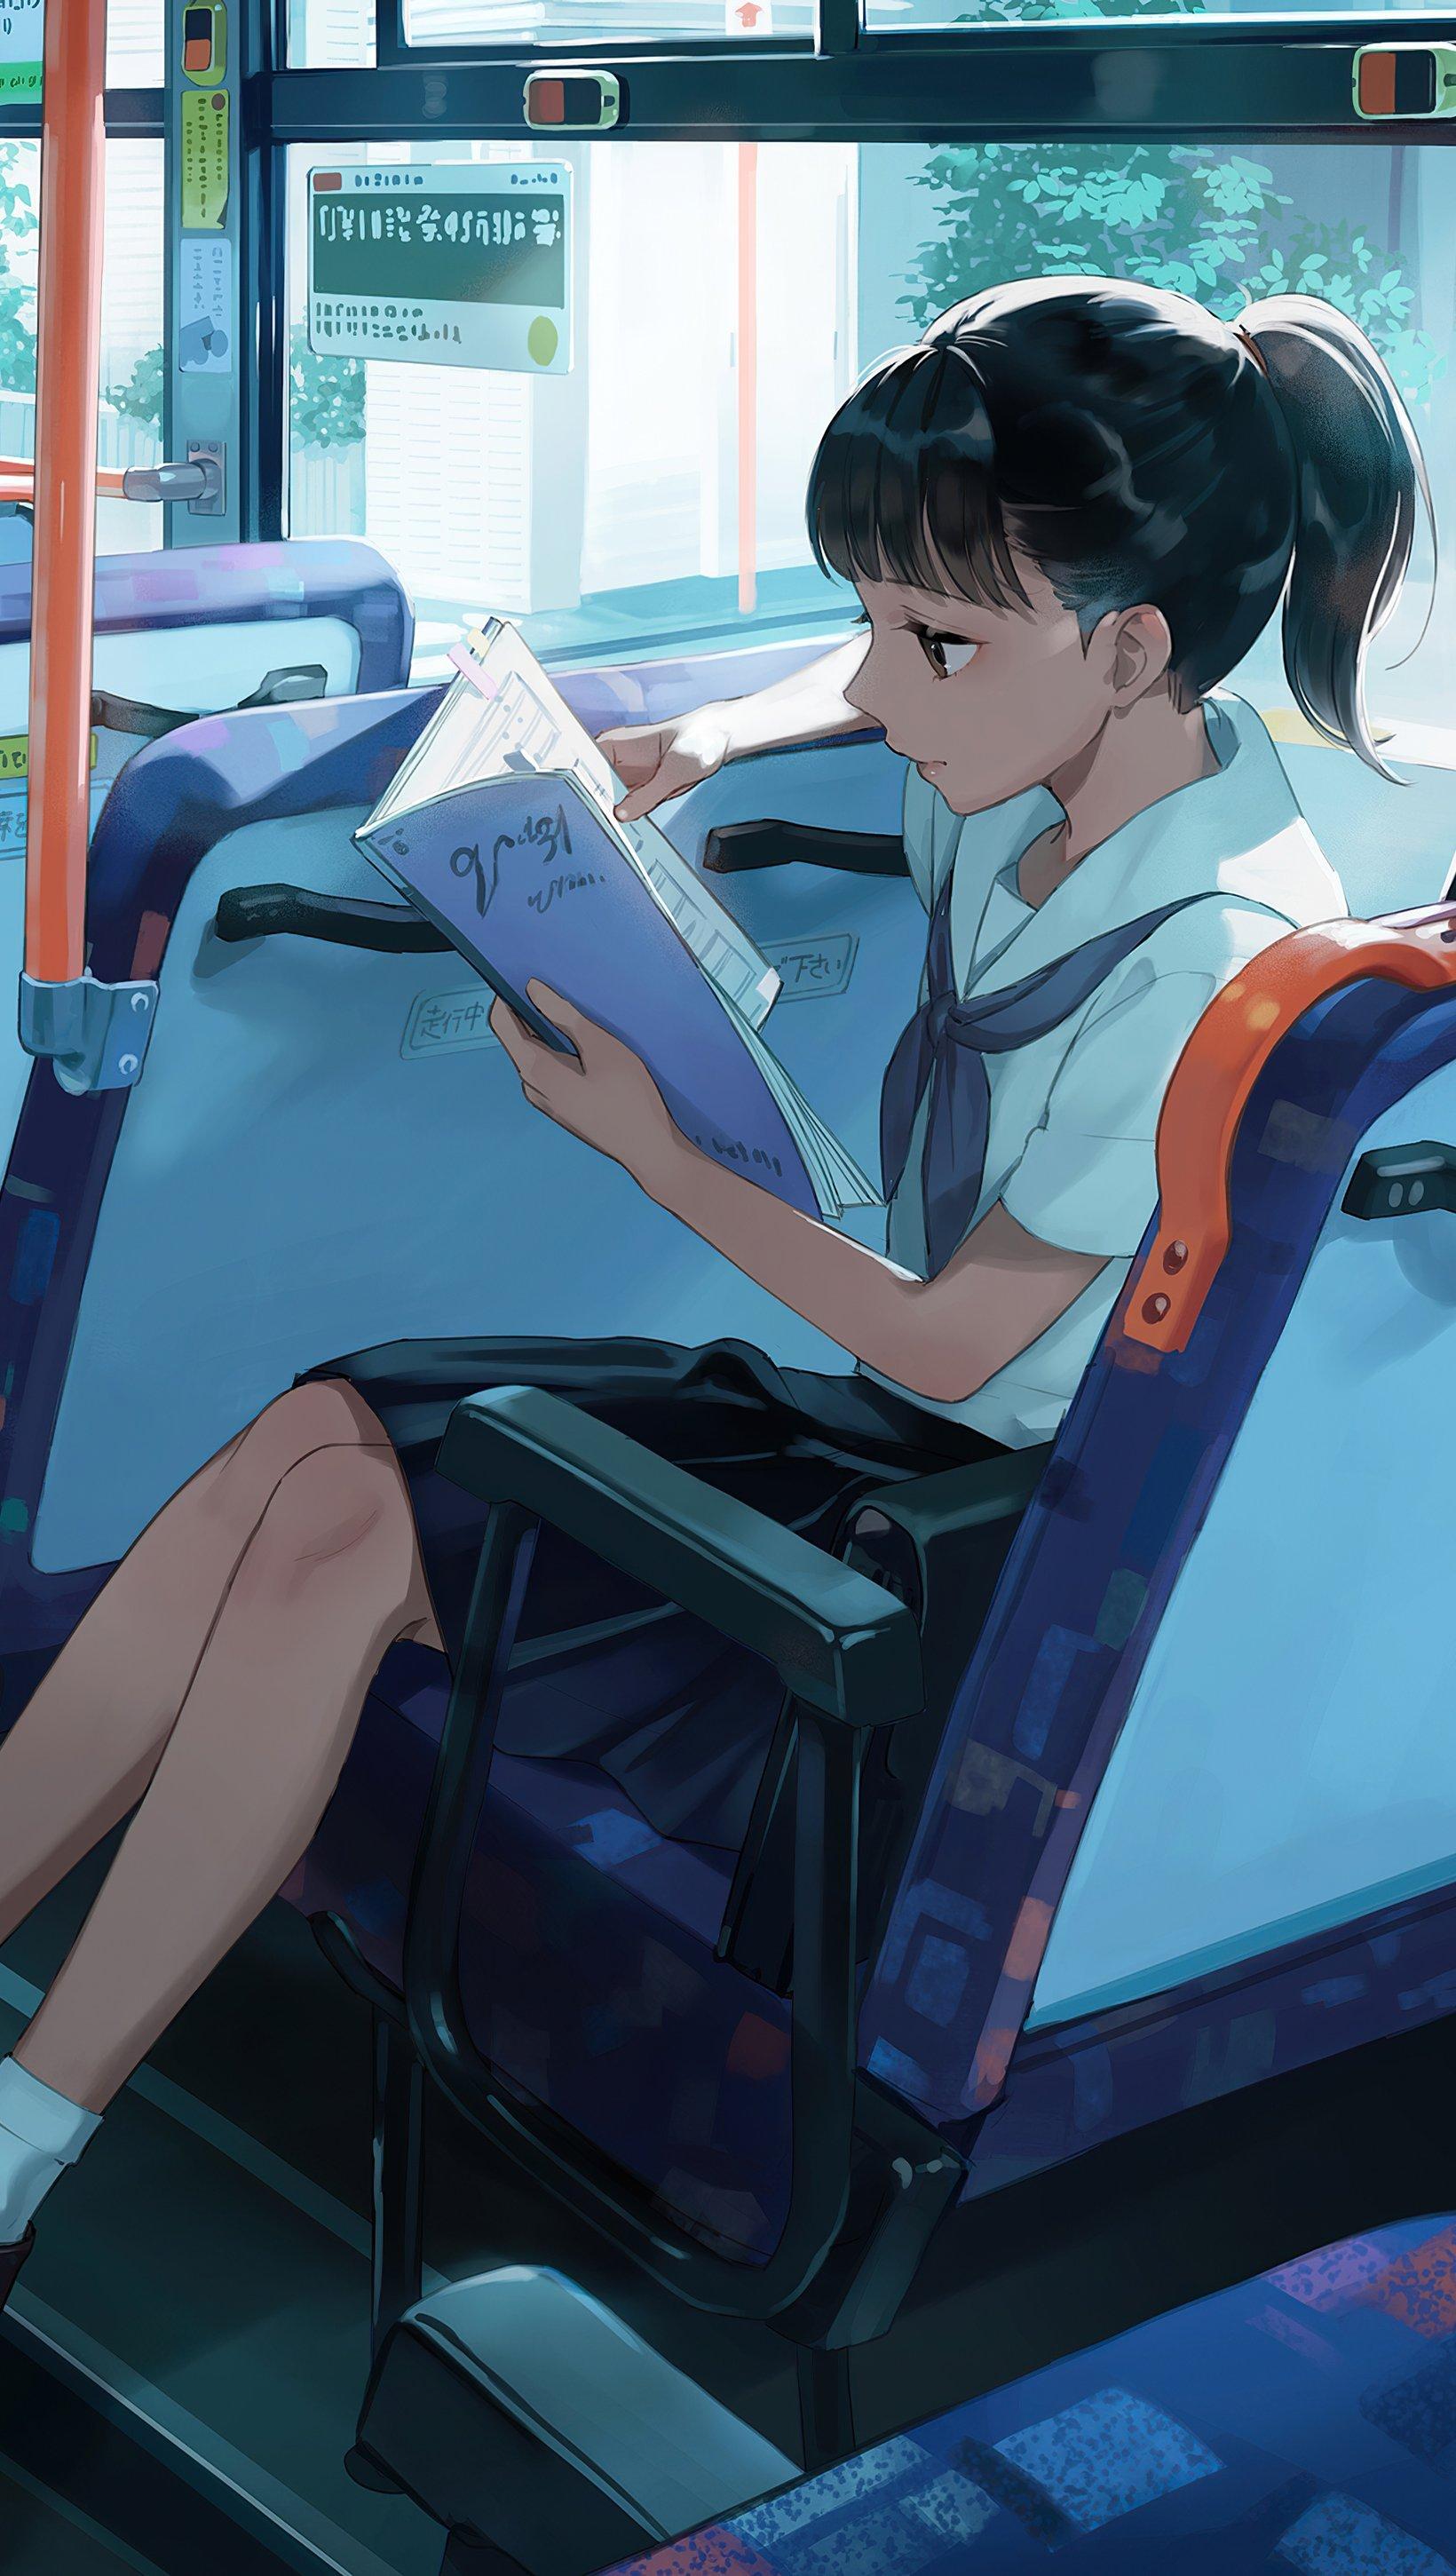 Fondos de pantalla Anime Estudiante en bus leyendo Vertical